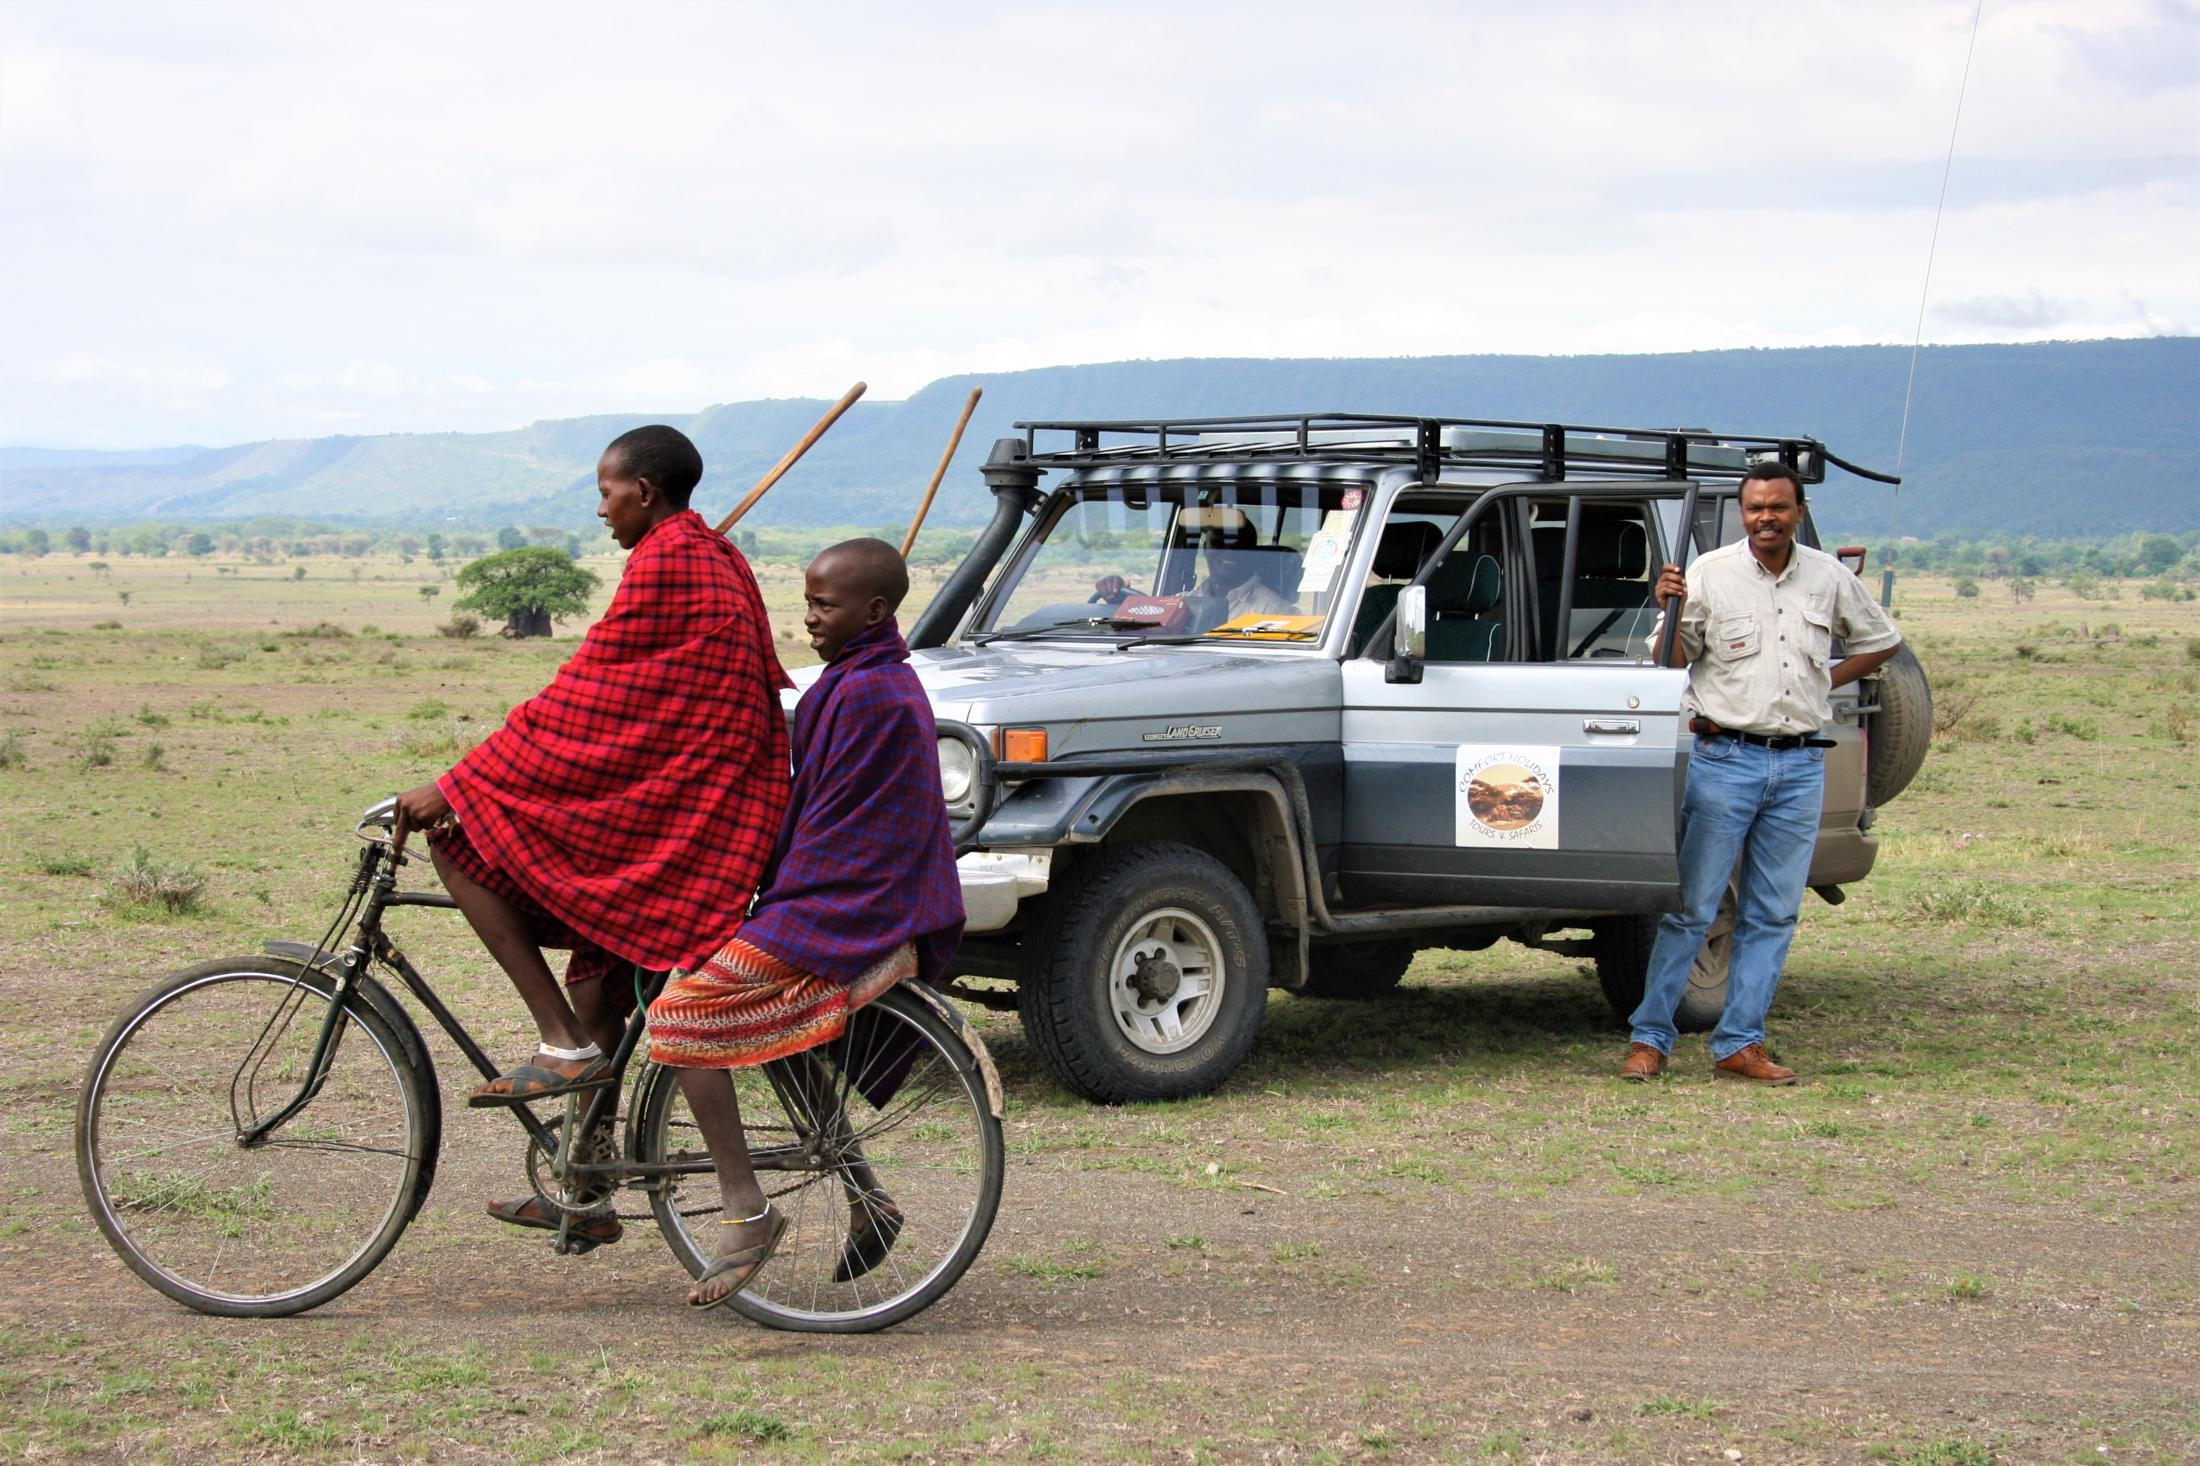 Luxe reizen Tanzania - Privé safari voertuig met eigen gids